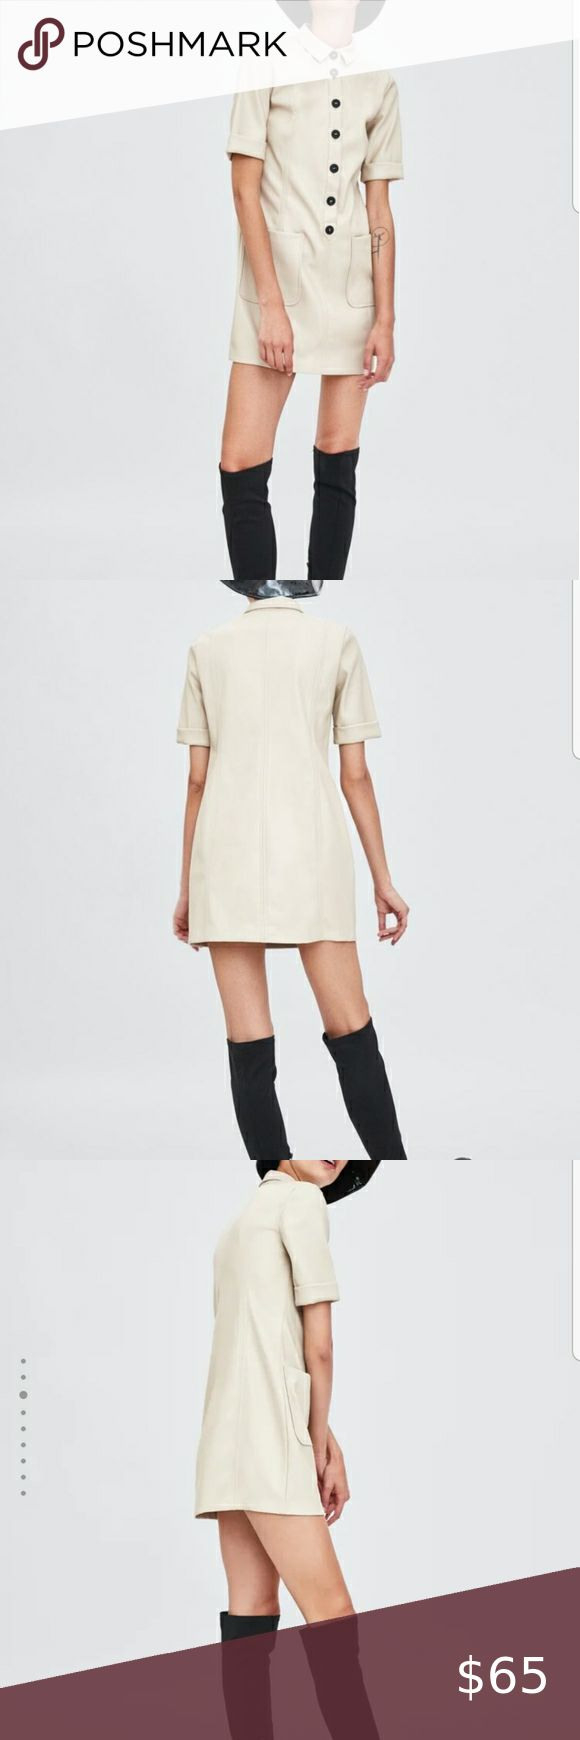 Zara Trafaluc Faux Leather Dress  Leather Look Dress